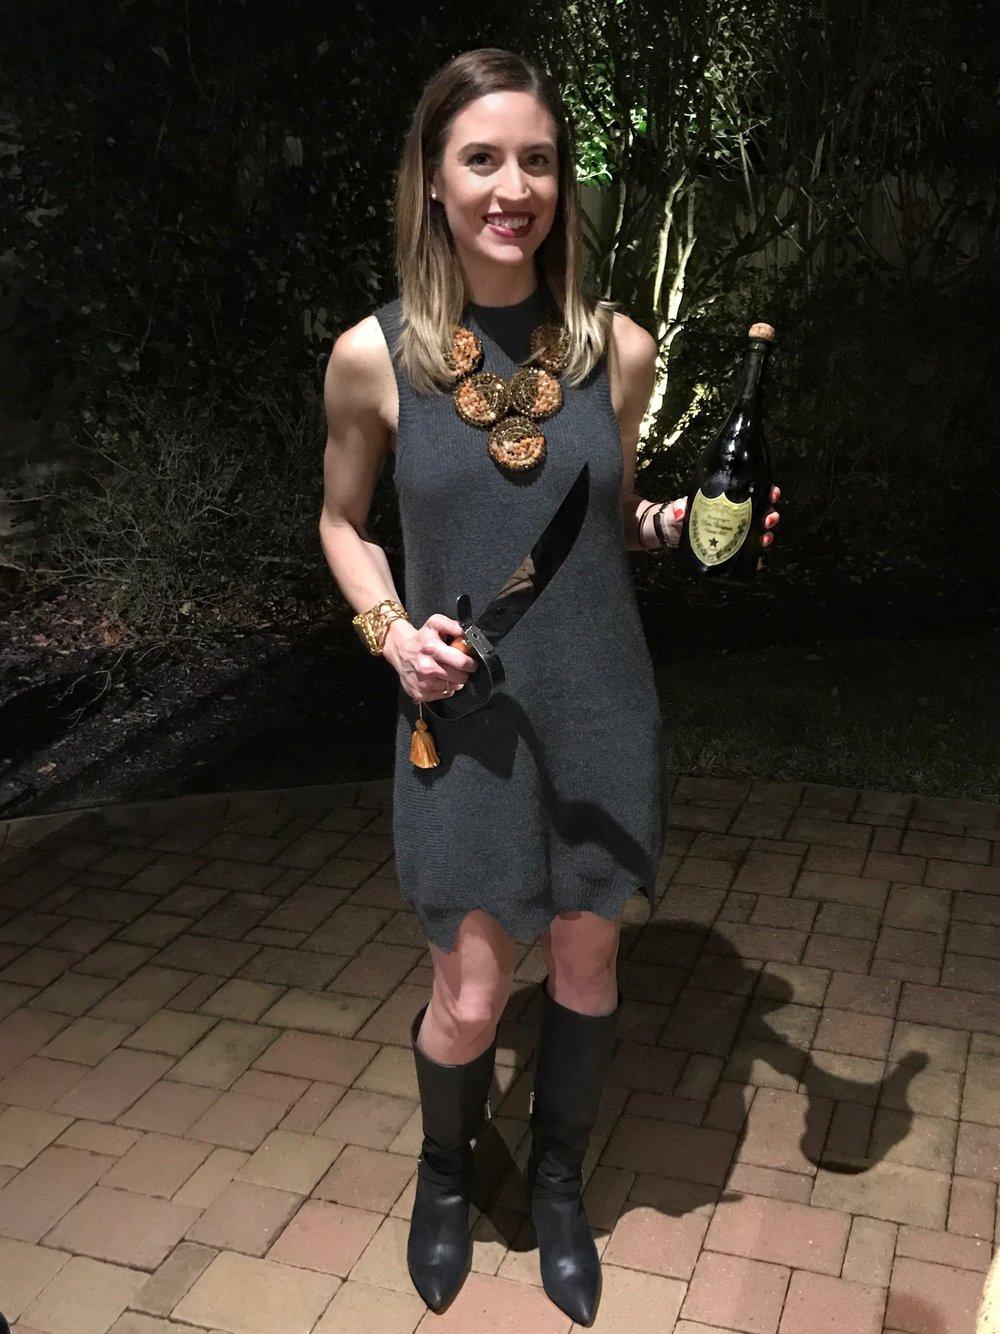 champagne sabering 12.18.16.jpg